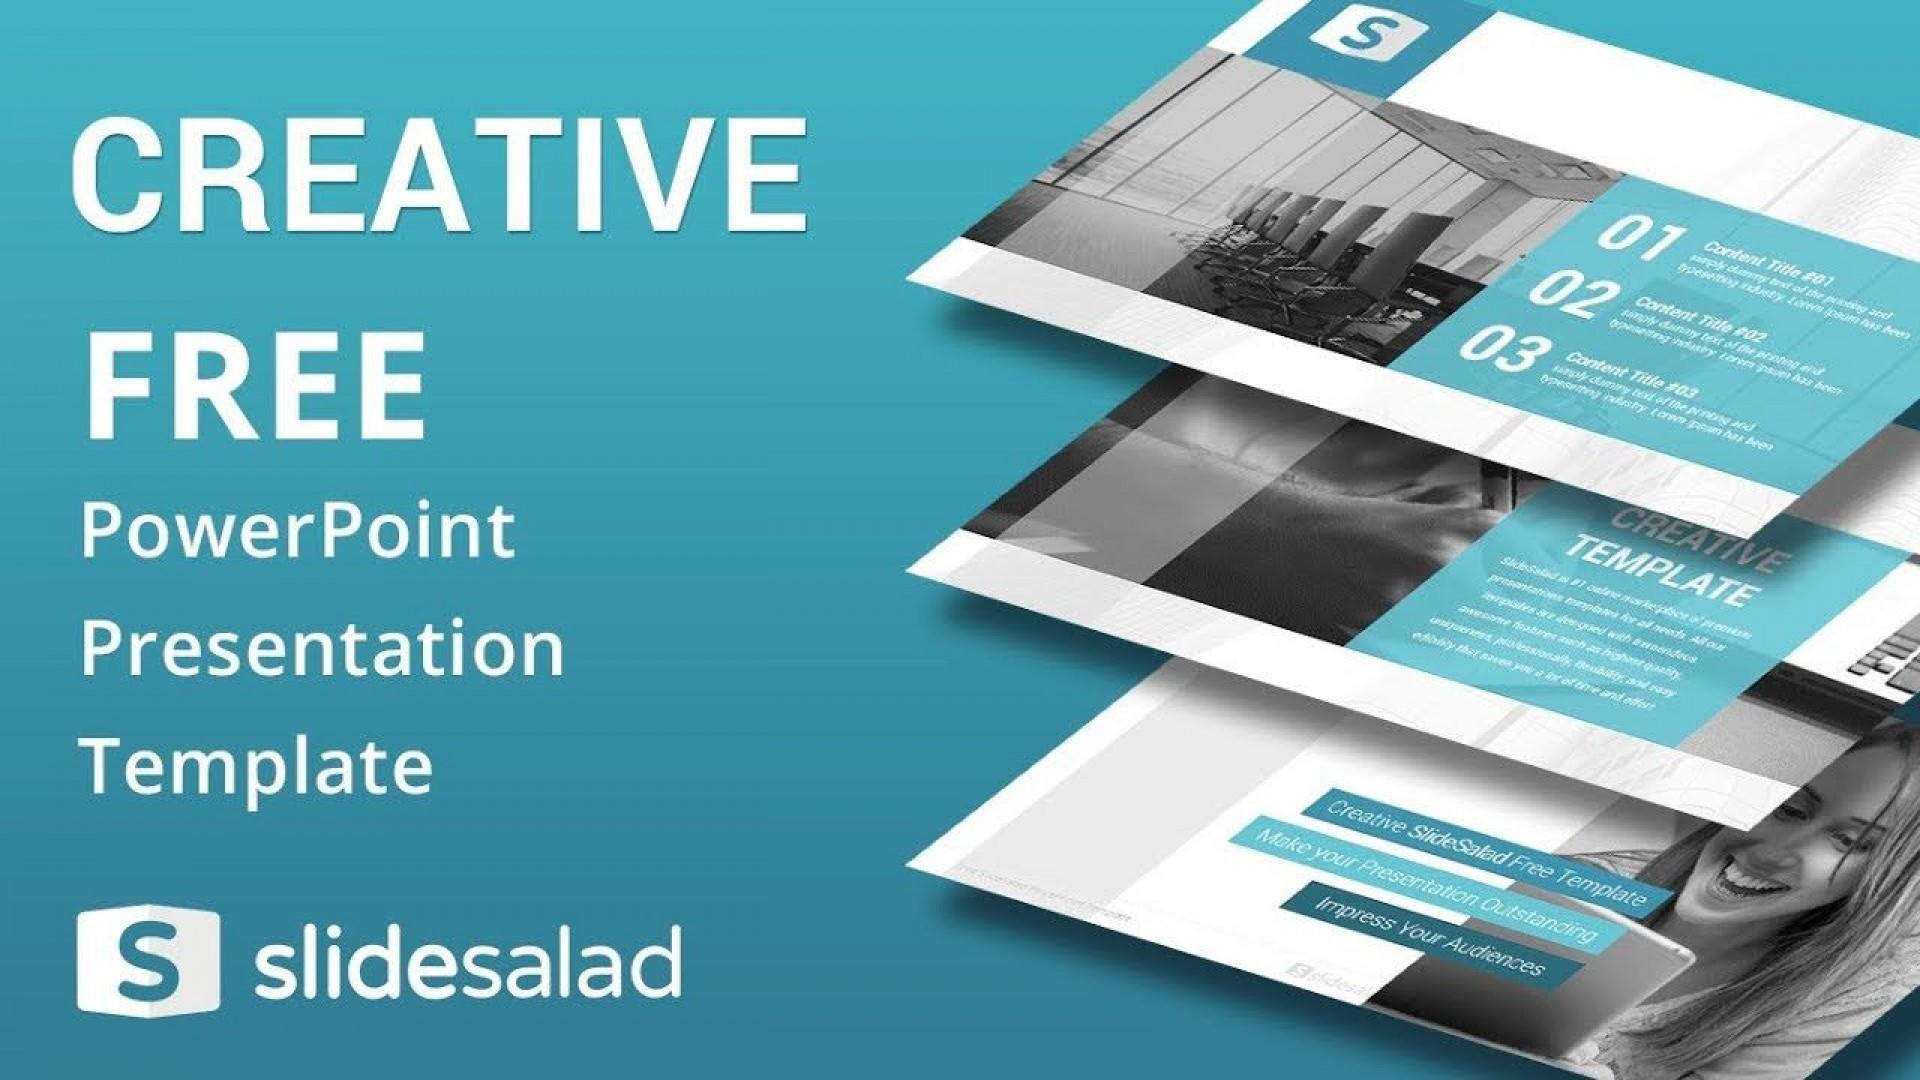 007 Marvelou Product Presentation Ppt Template Free Download Design 1920